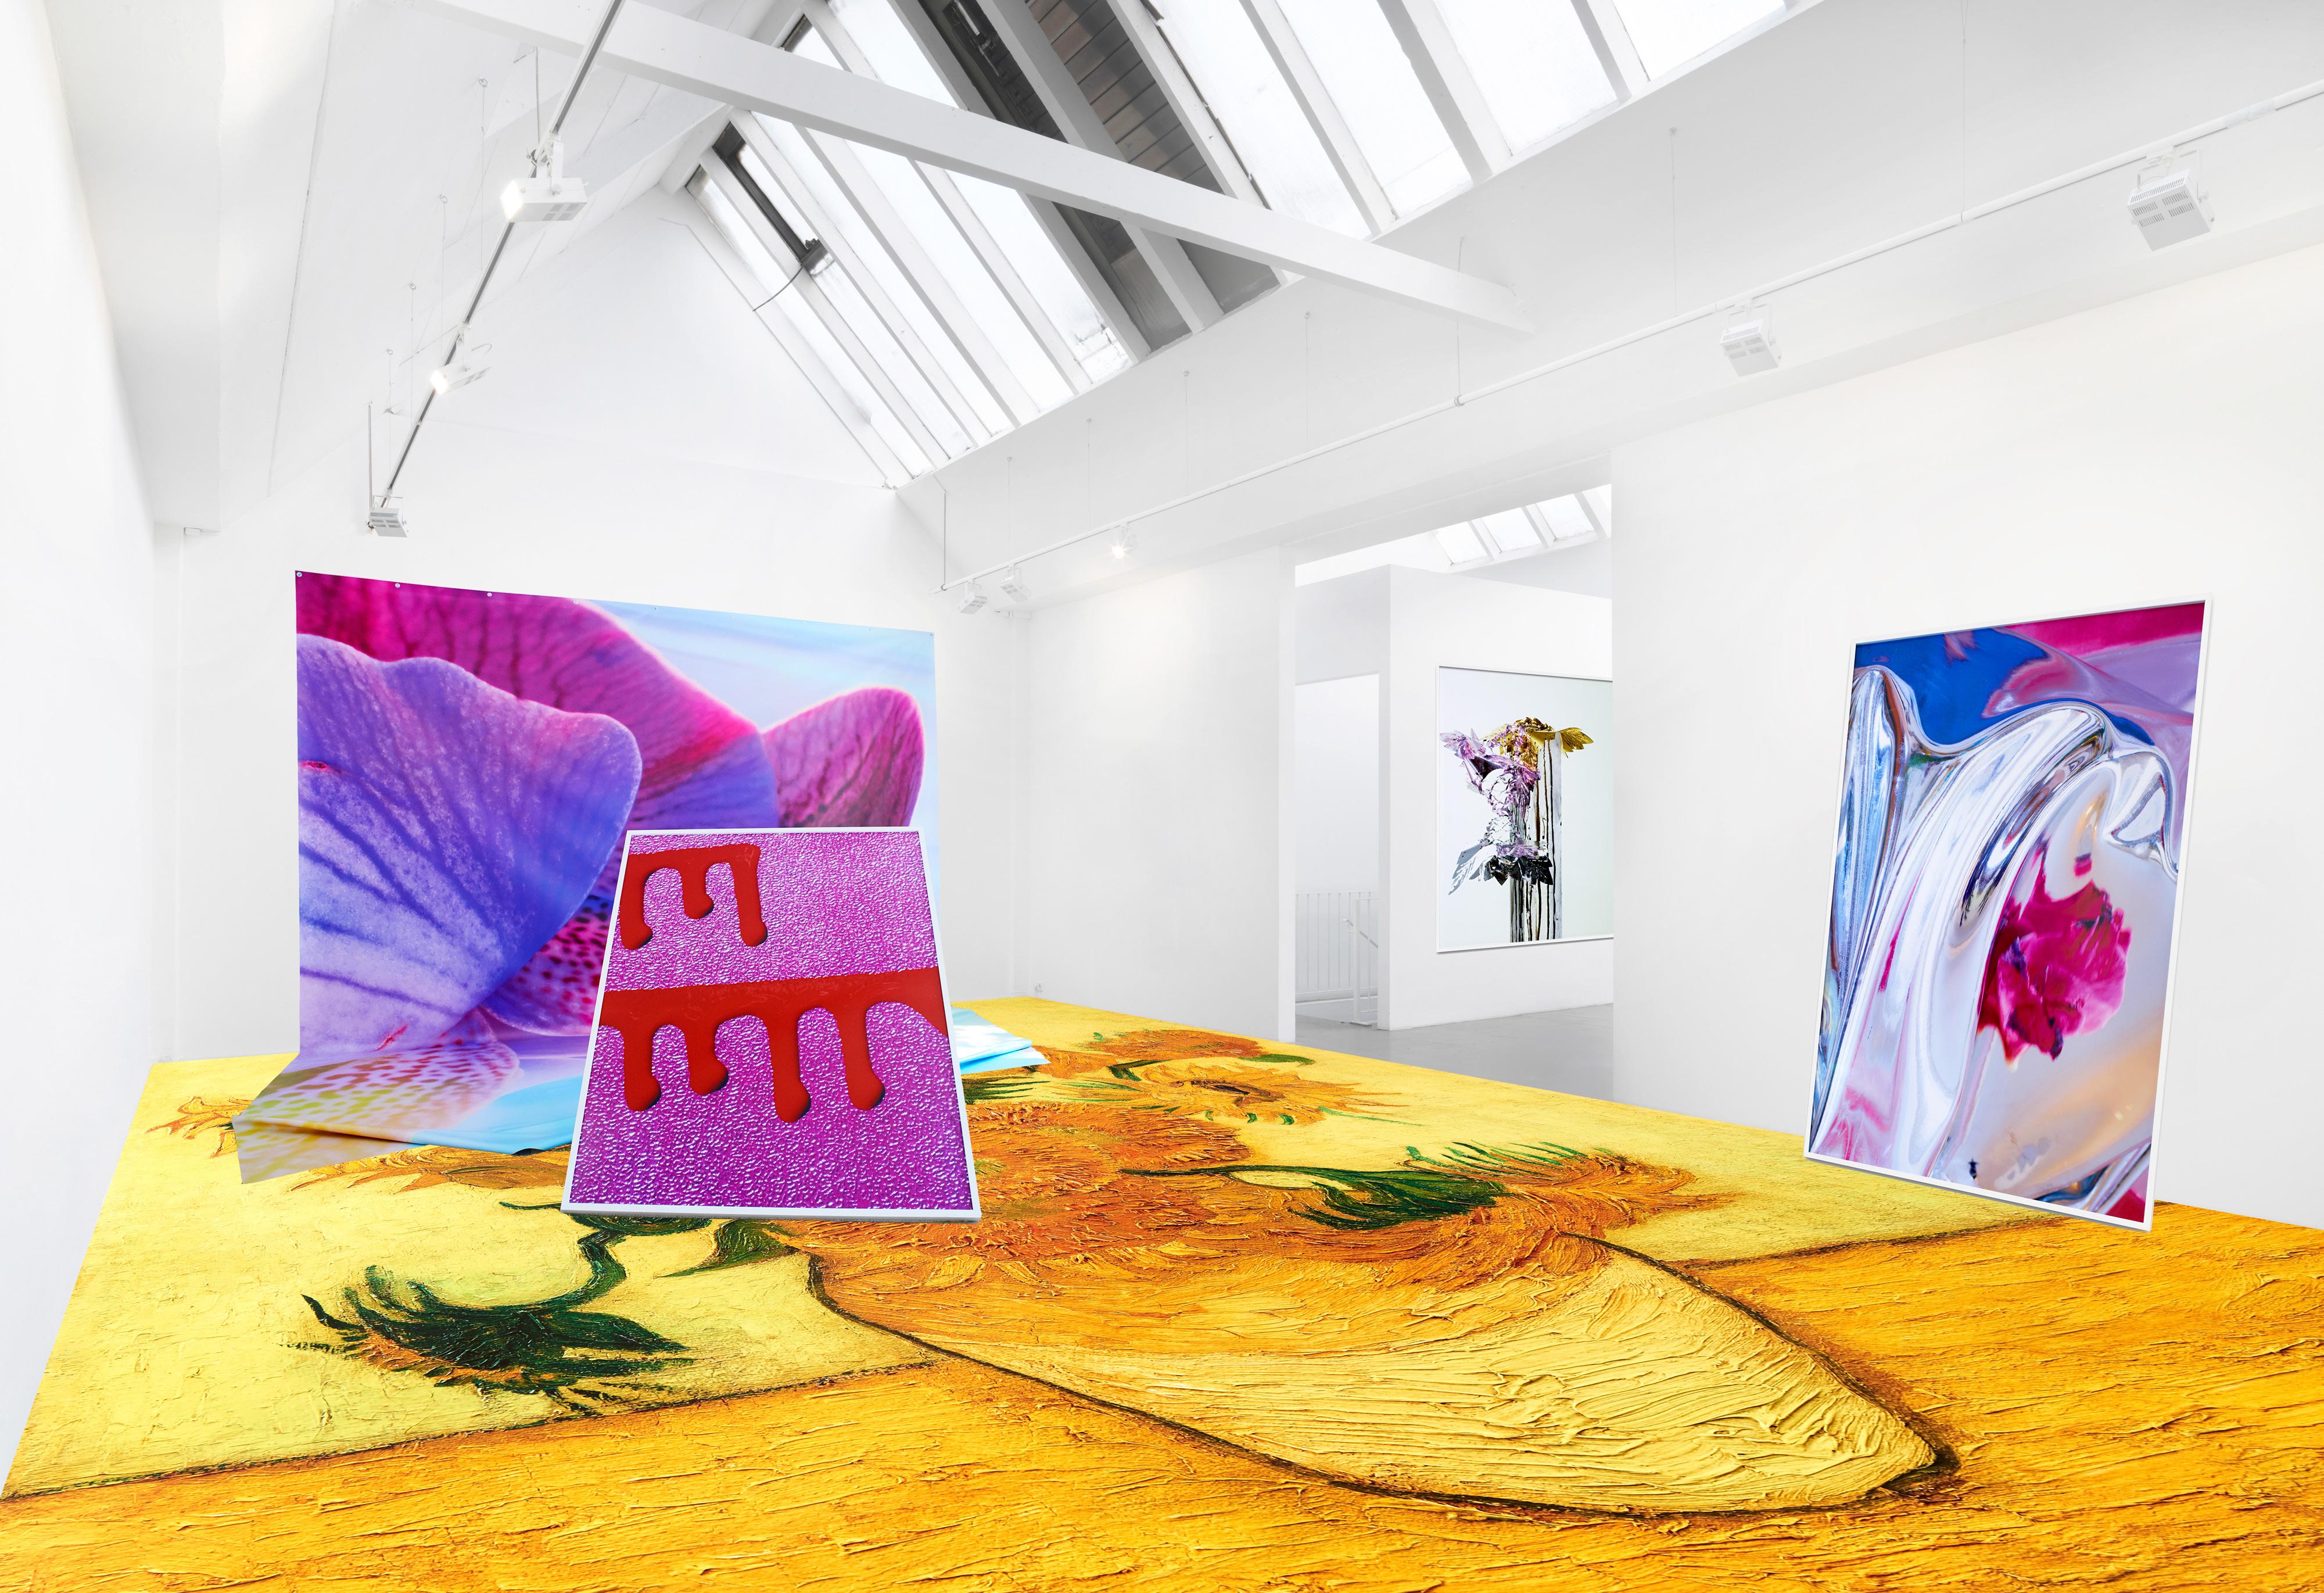 Galerie Barbara Thumm \ New Viewings #7 \ Marius Glauer